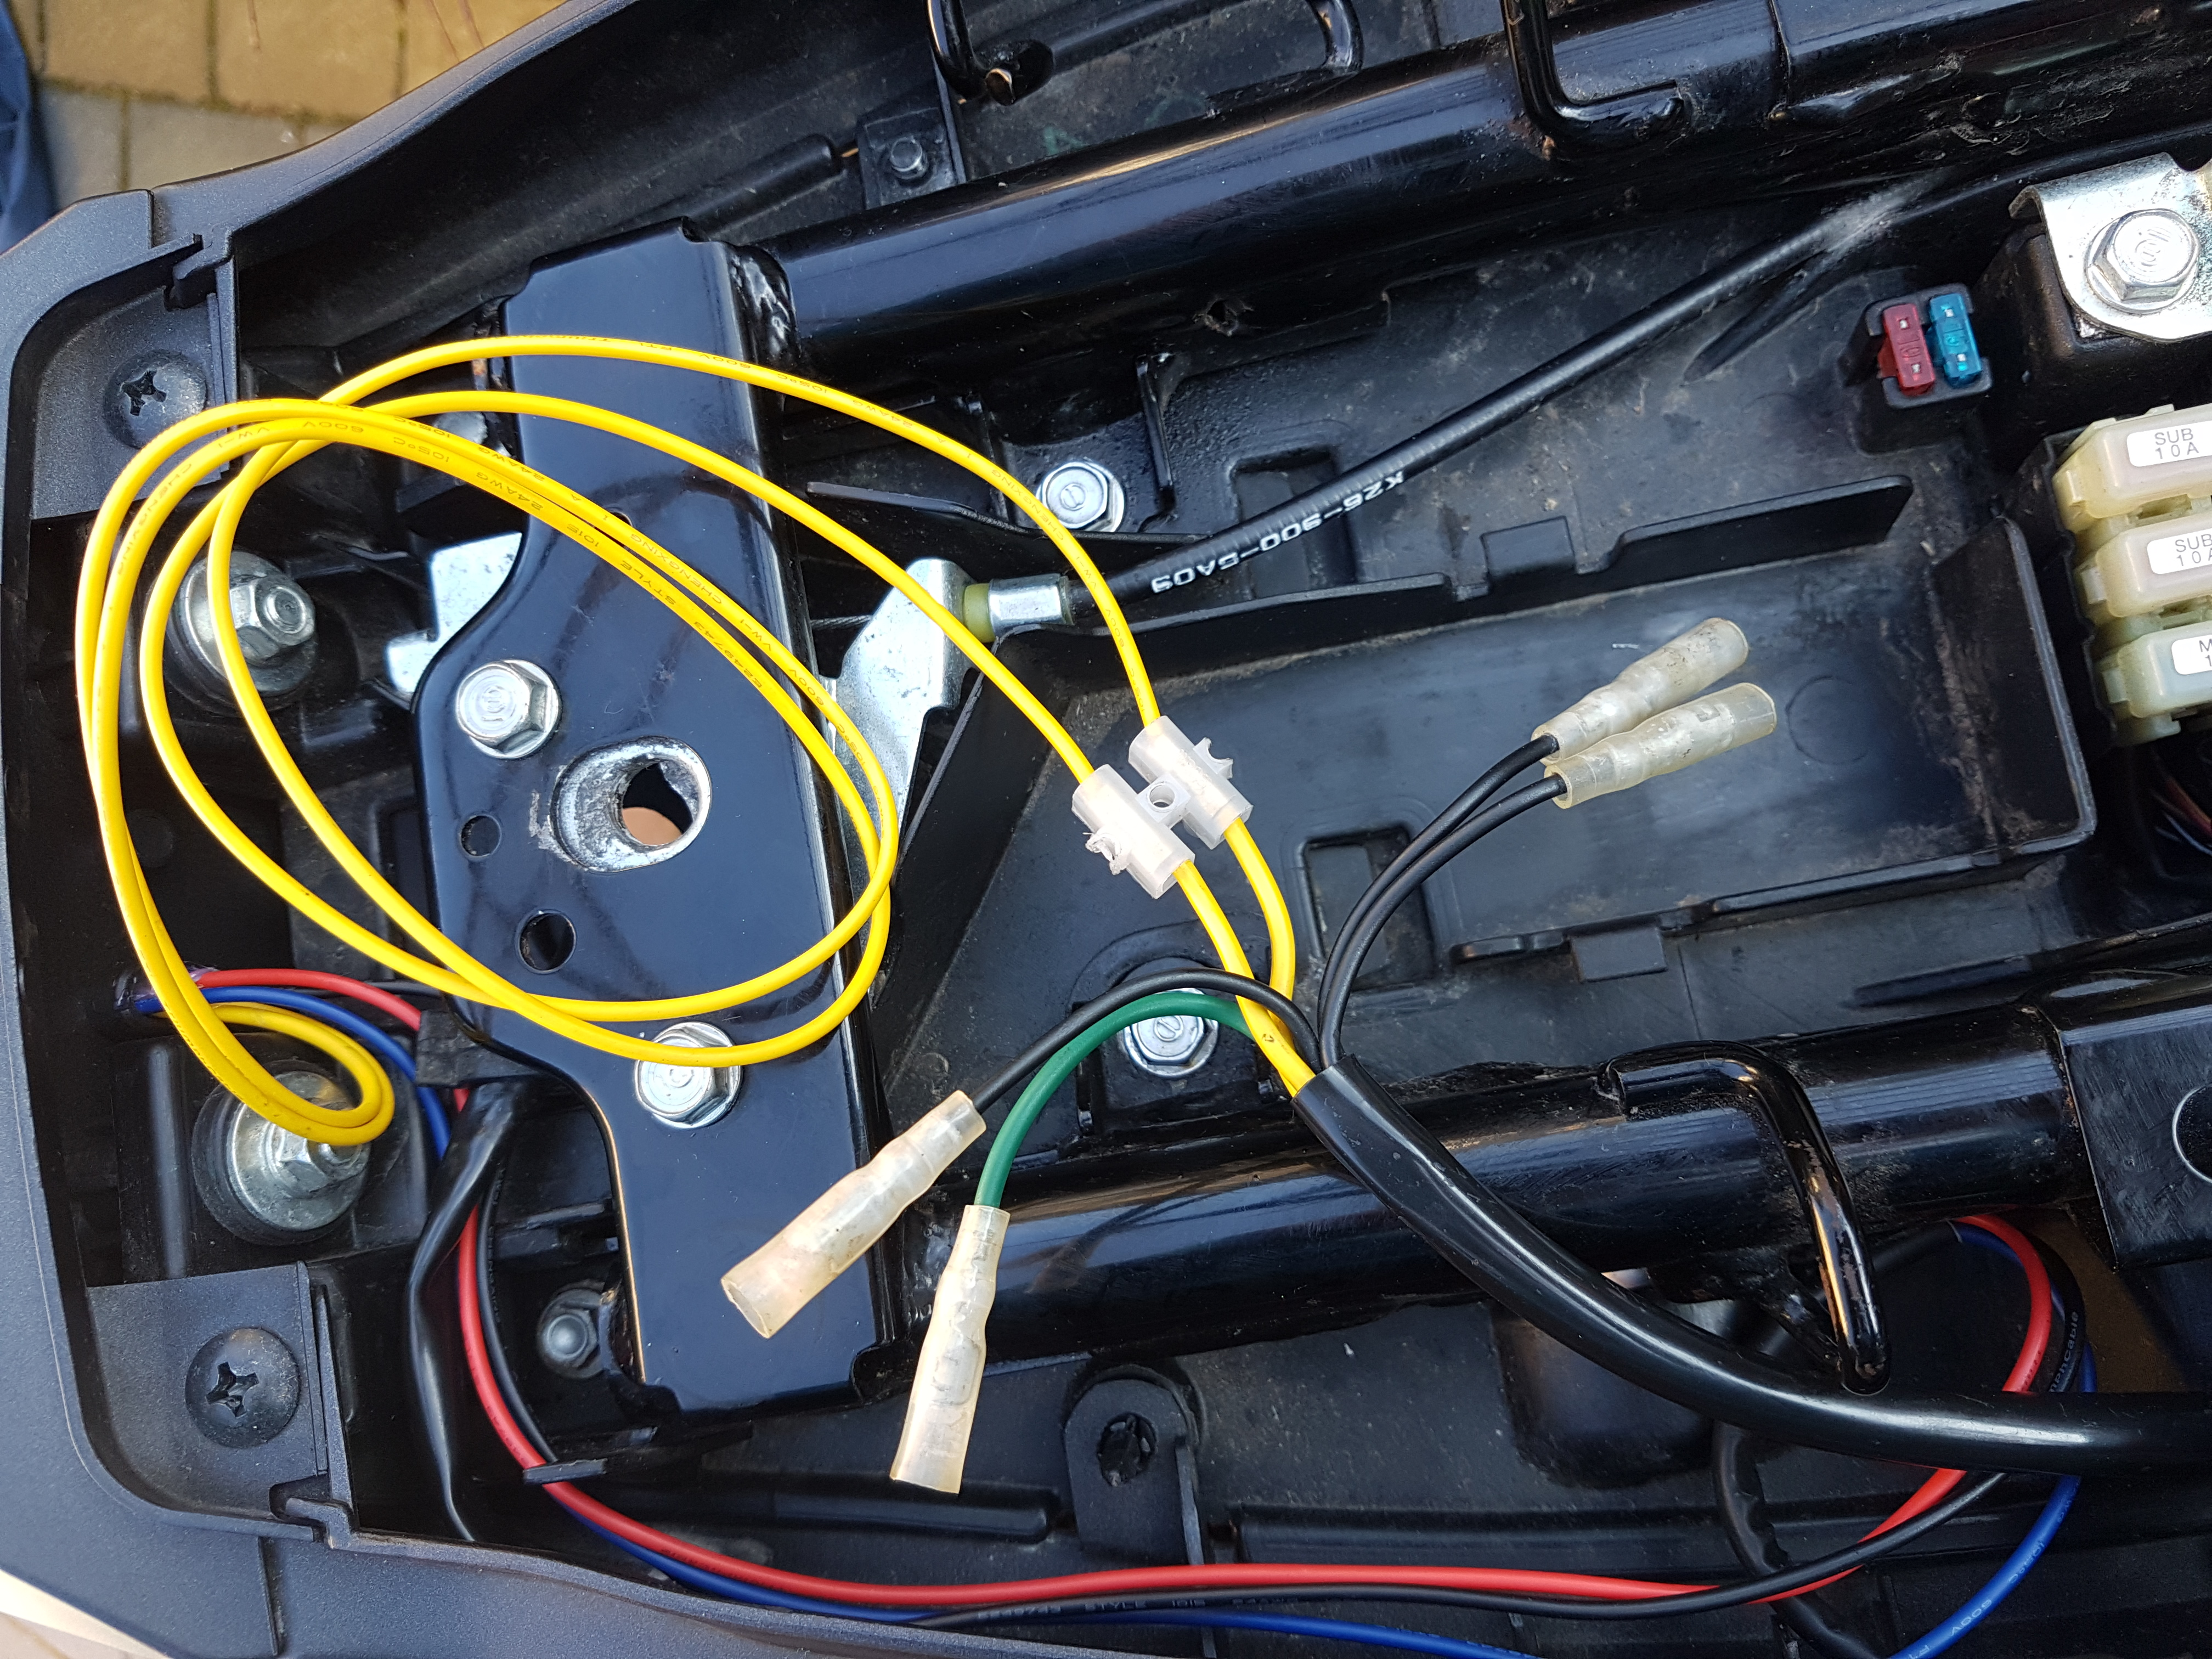 [SCHEMATICS_49CH]  Integrated Tail Light Wiring Issue   Honda Grom   Integrated Tail Light Wiring Diagram      Honda Grom